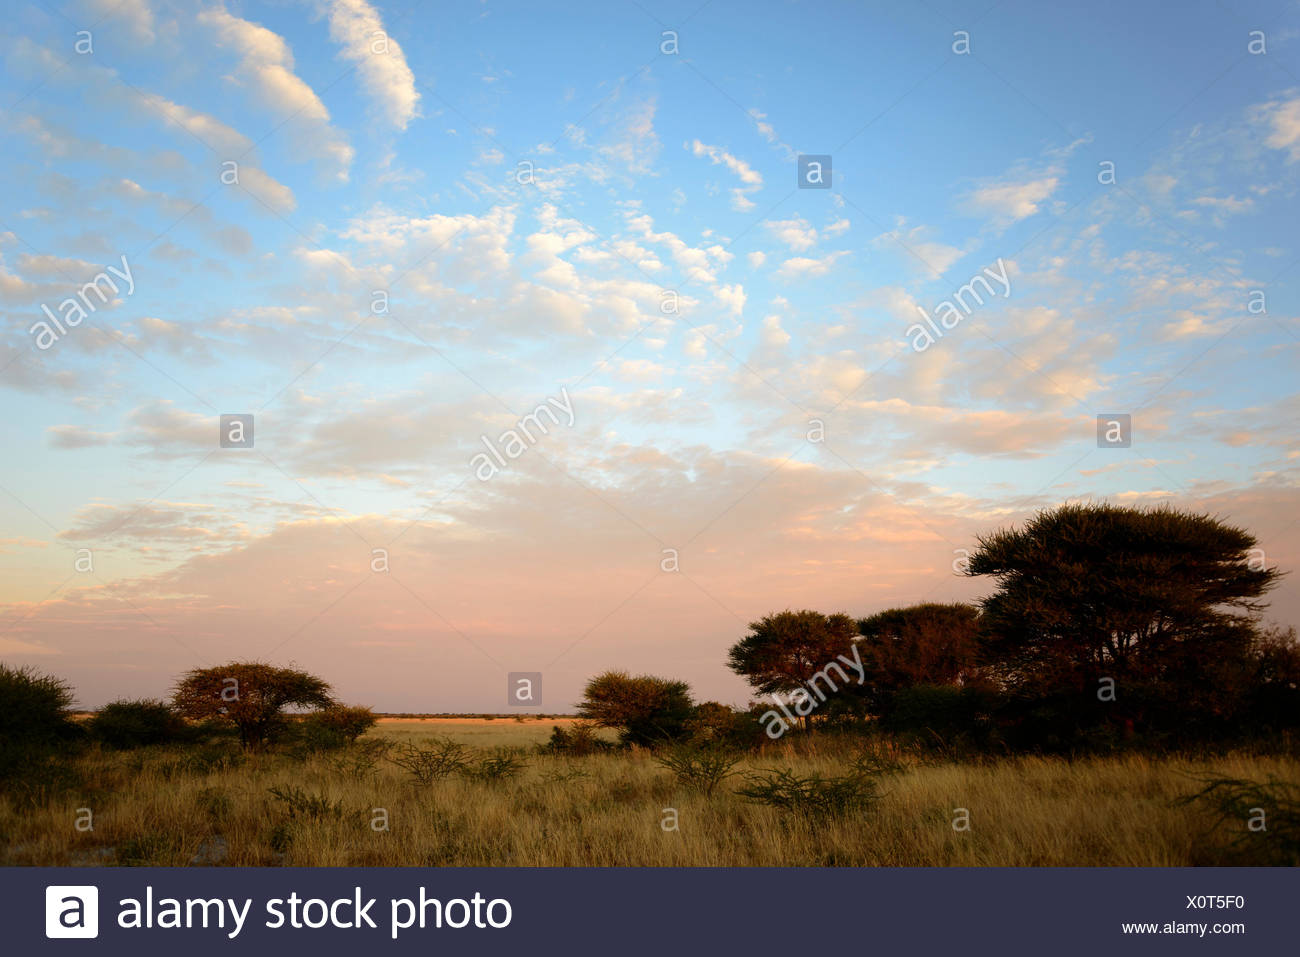 Sunrise, Deception Valley, Central Kalahari Game Reserve, Botswana - Stock Image